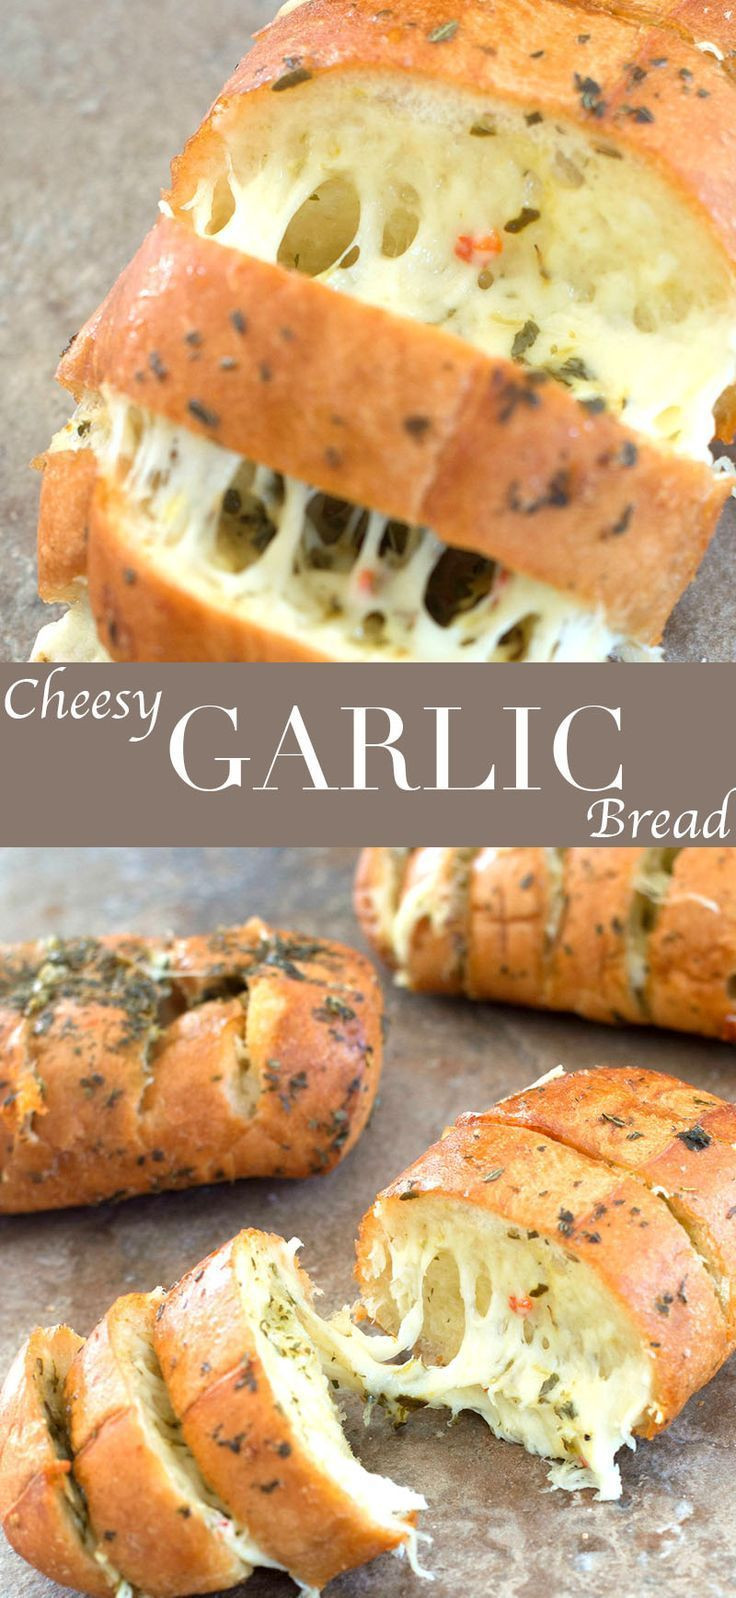 Healthy Garlic Bread Recipe  Cheesy Garlic Bread With Italian Spices Recipe